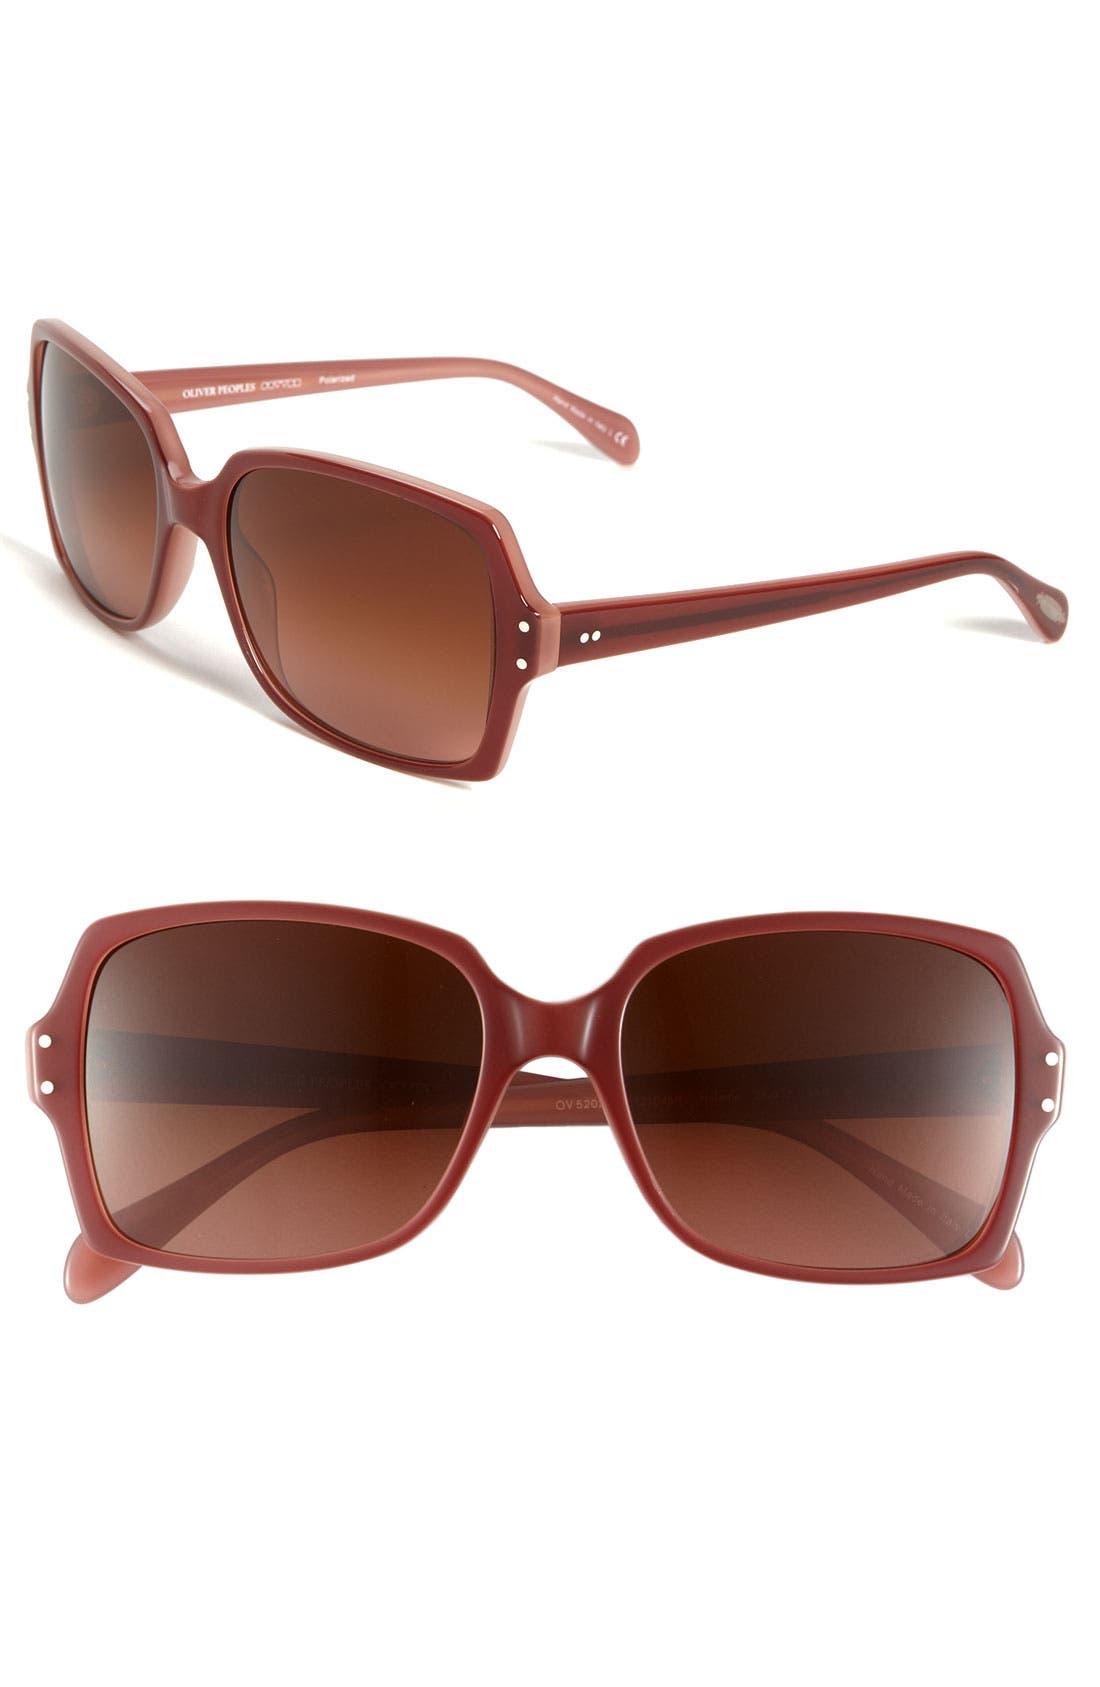 Alternate Image 1 Selected - Oliver Peoples 'Helaine' 56mm Sunglasses